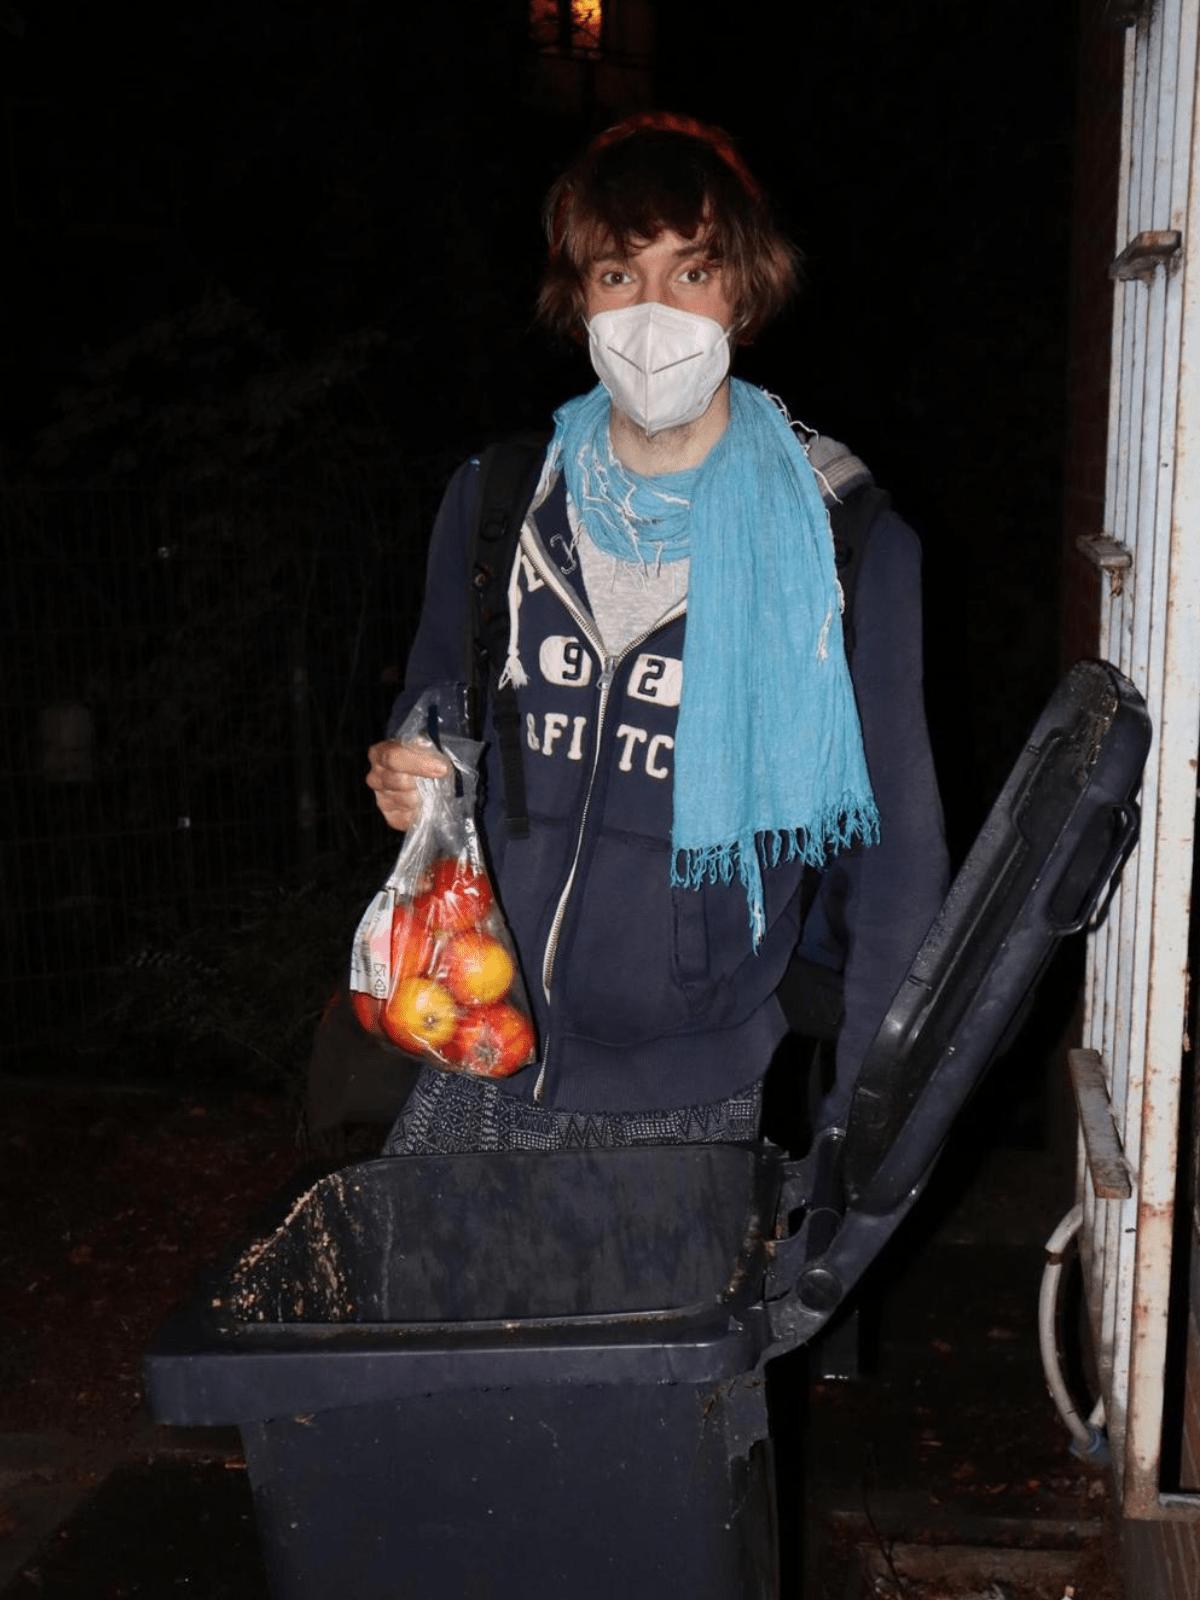 Marcoo Valentínoo hält gerettete Äpfel in der Hand.